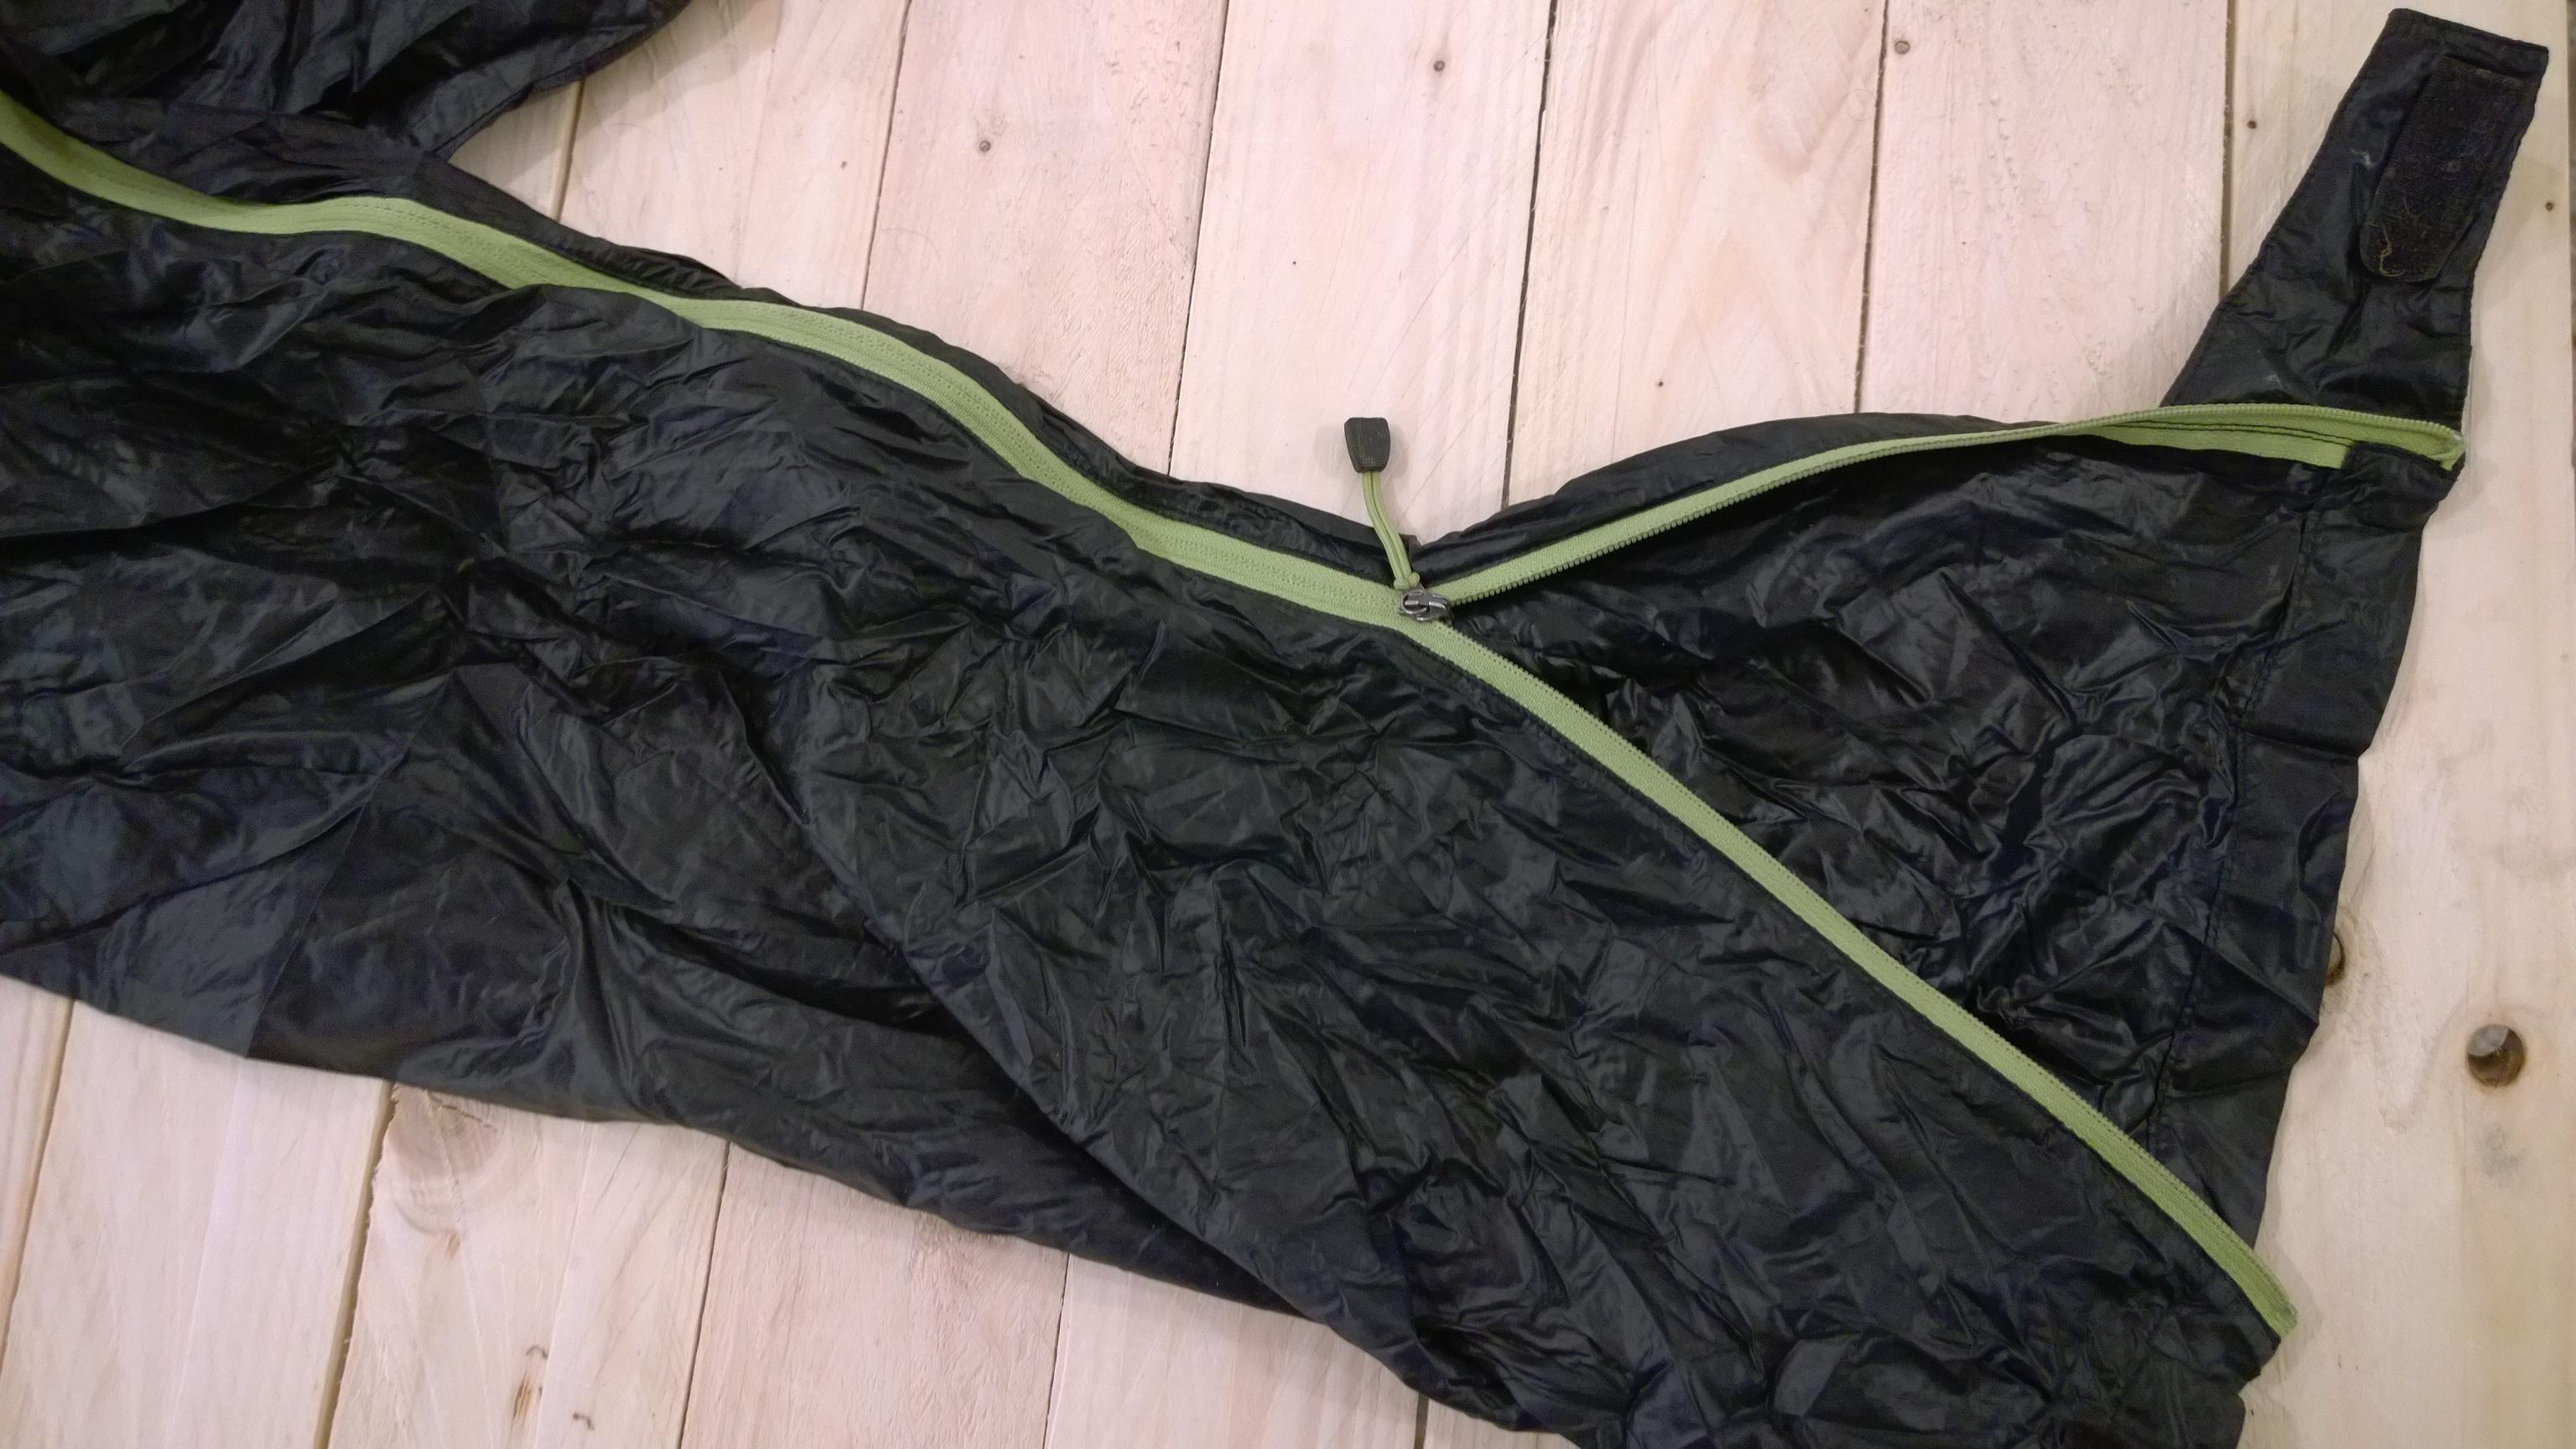 Outdoor recenzia: CAMP Magic Pants, celorozopínacie zipsy